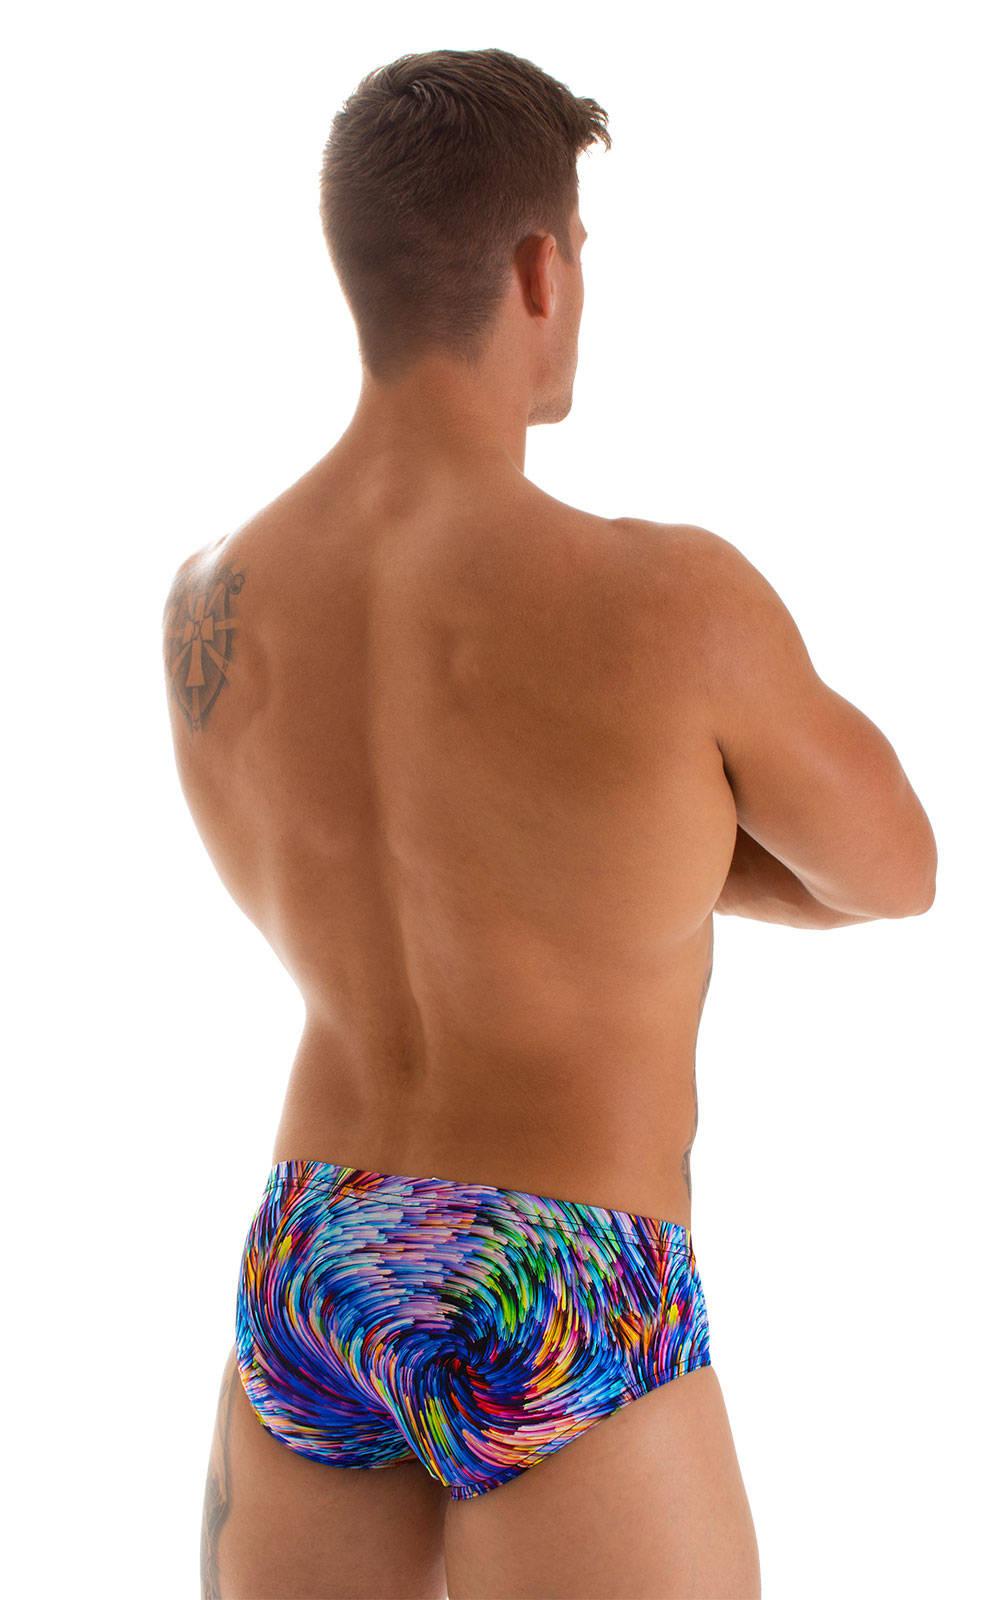 Pouch Brief Swimsuit in Illumine 5